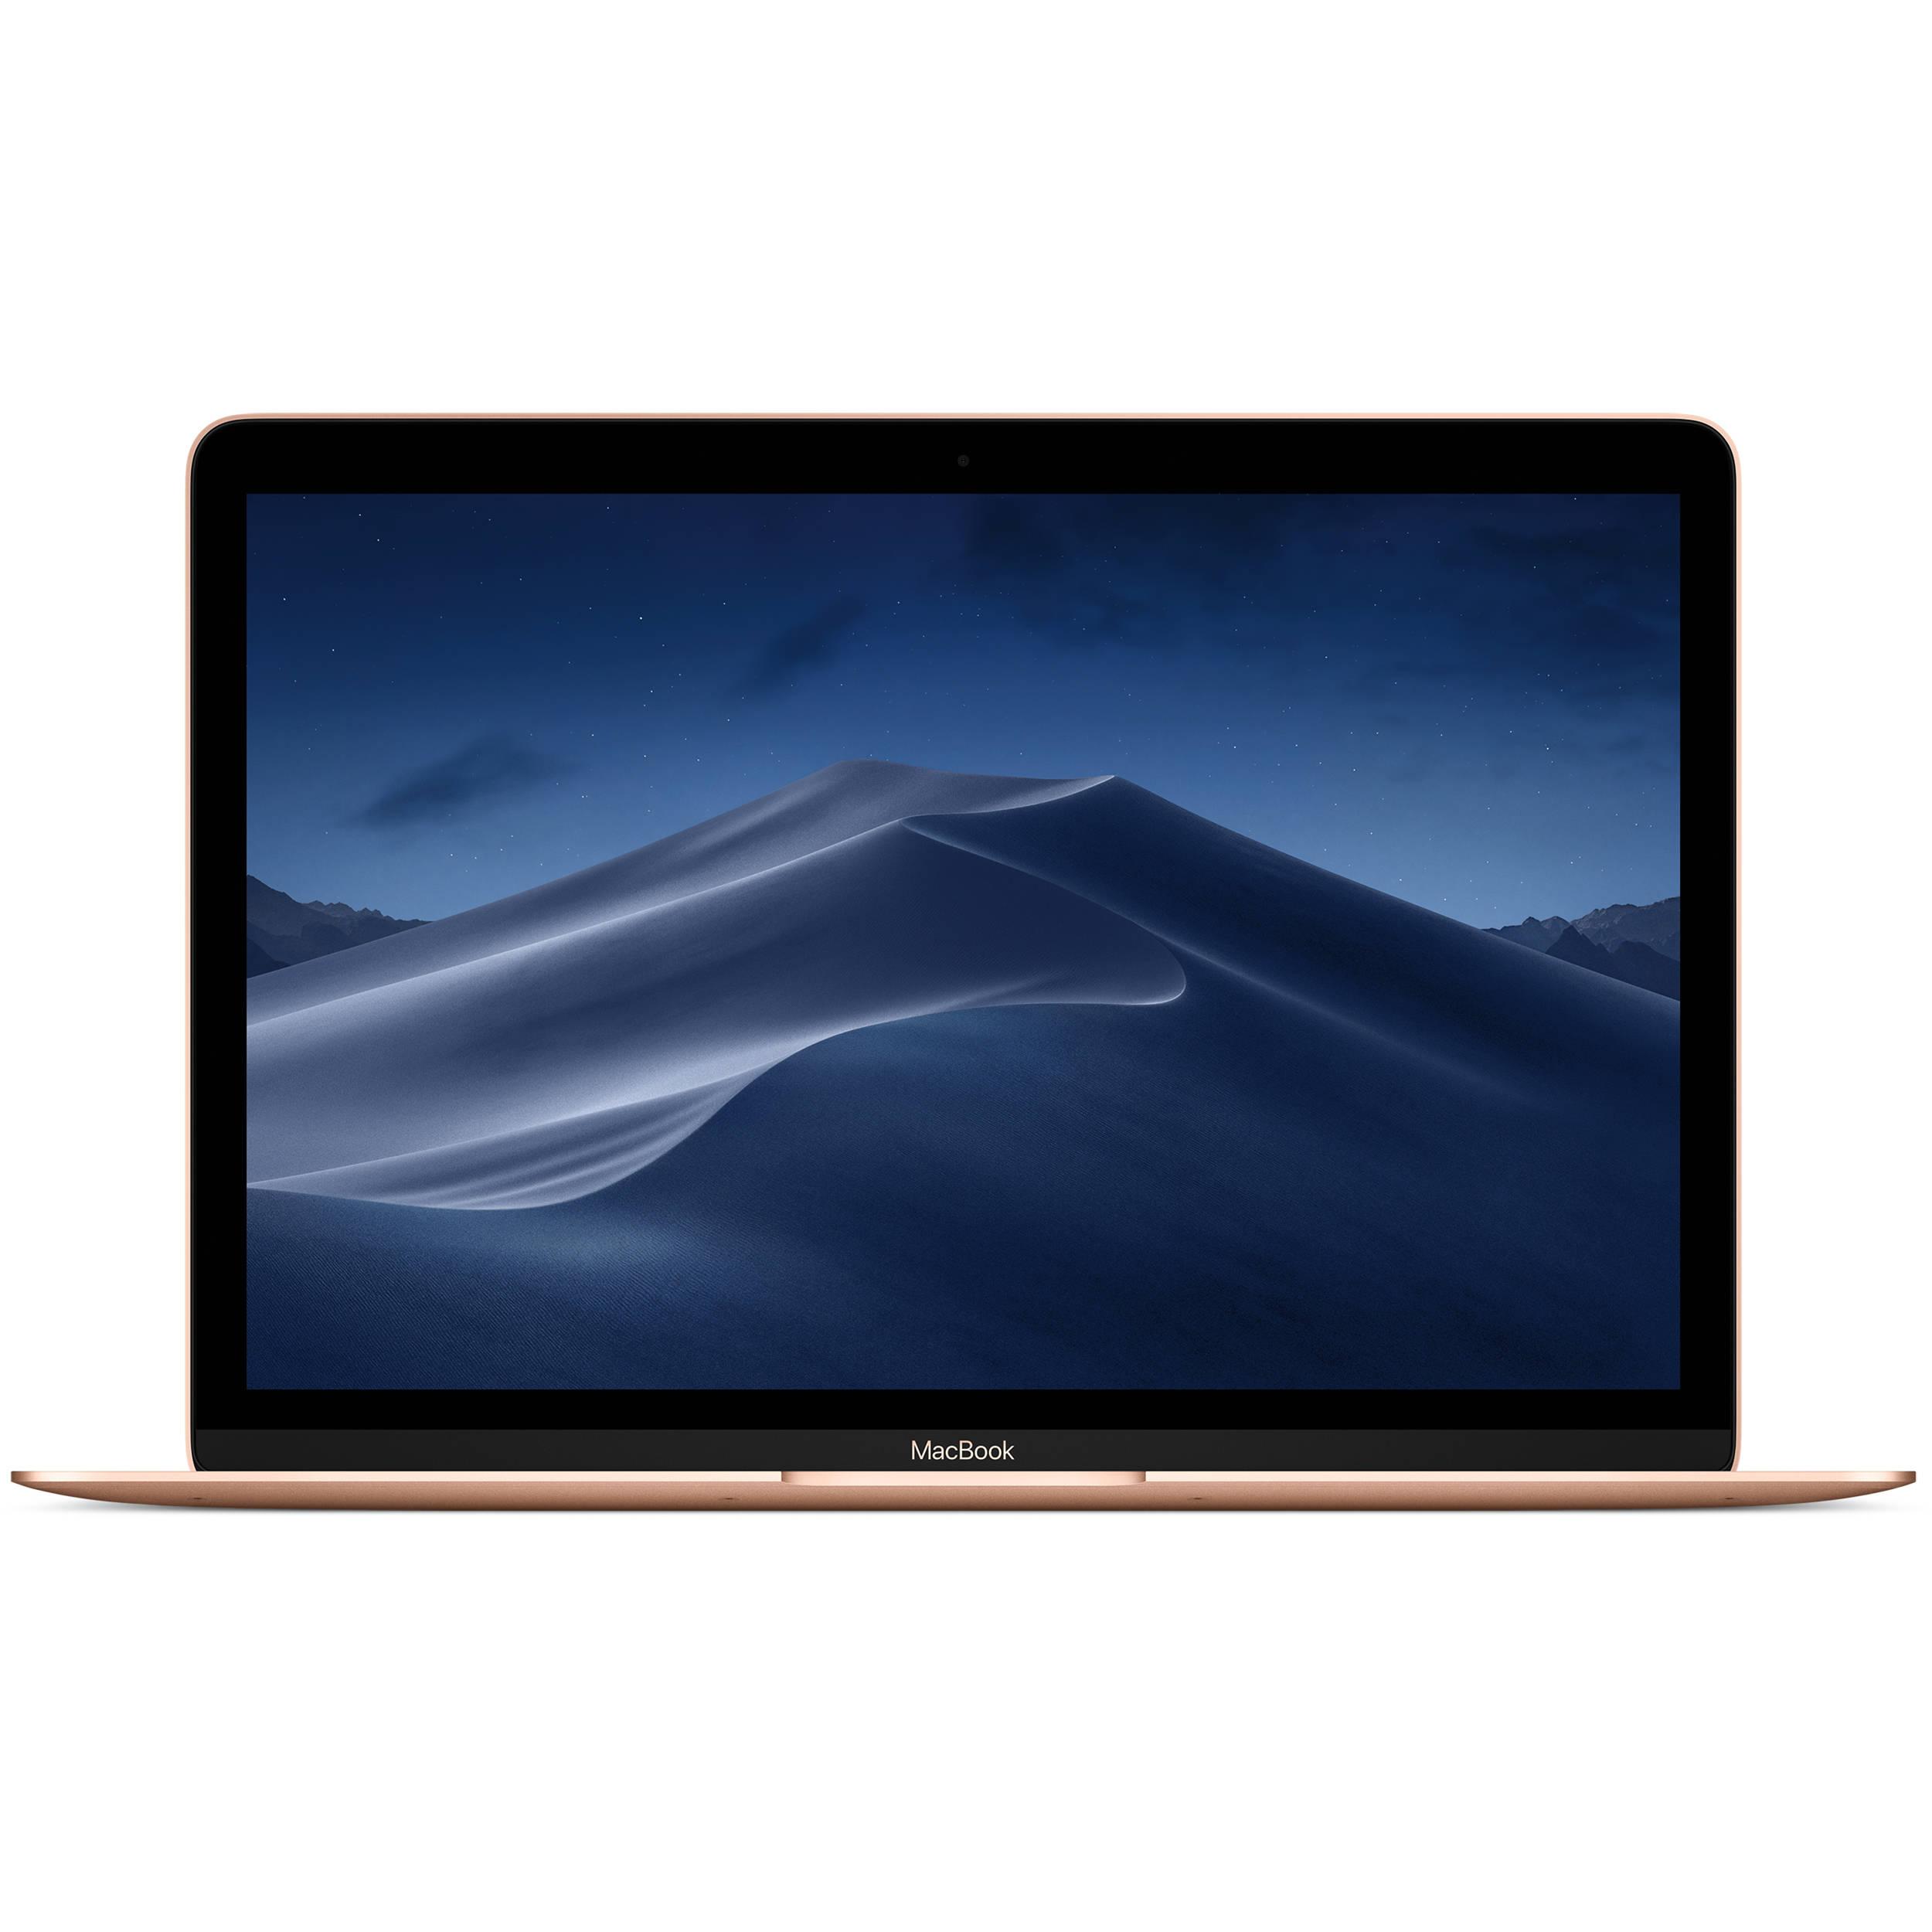 "Apple - MacBook 12"" Retina Display - Intel Core i5 - 8GB Memory - 512GB Flash Storage (Latest Model) - Gold"